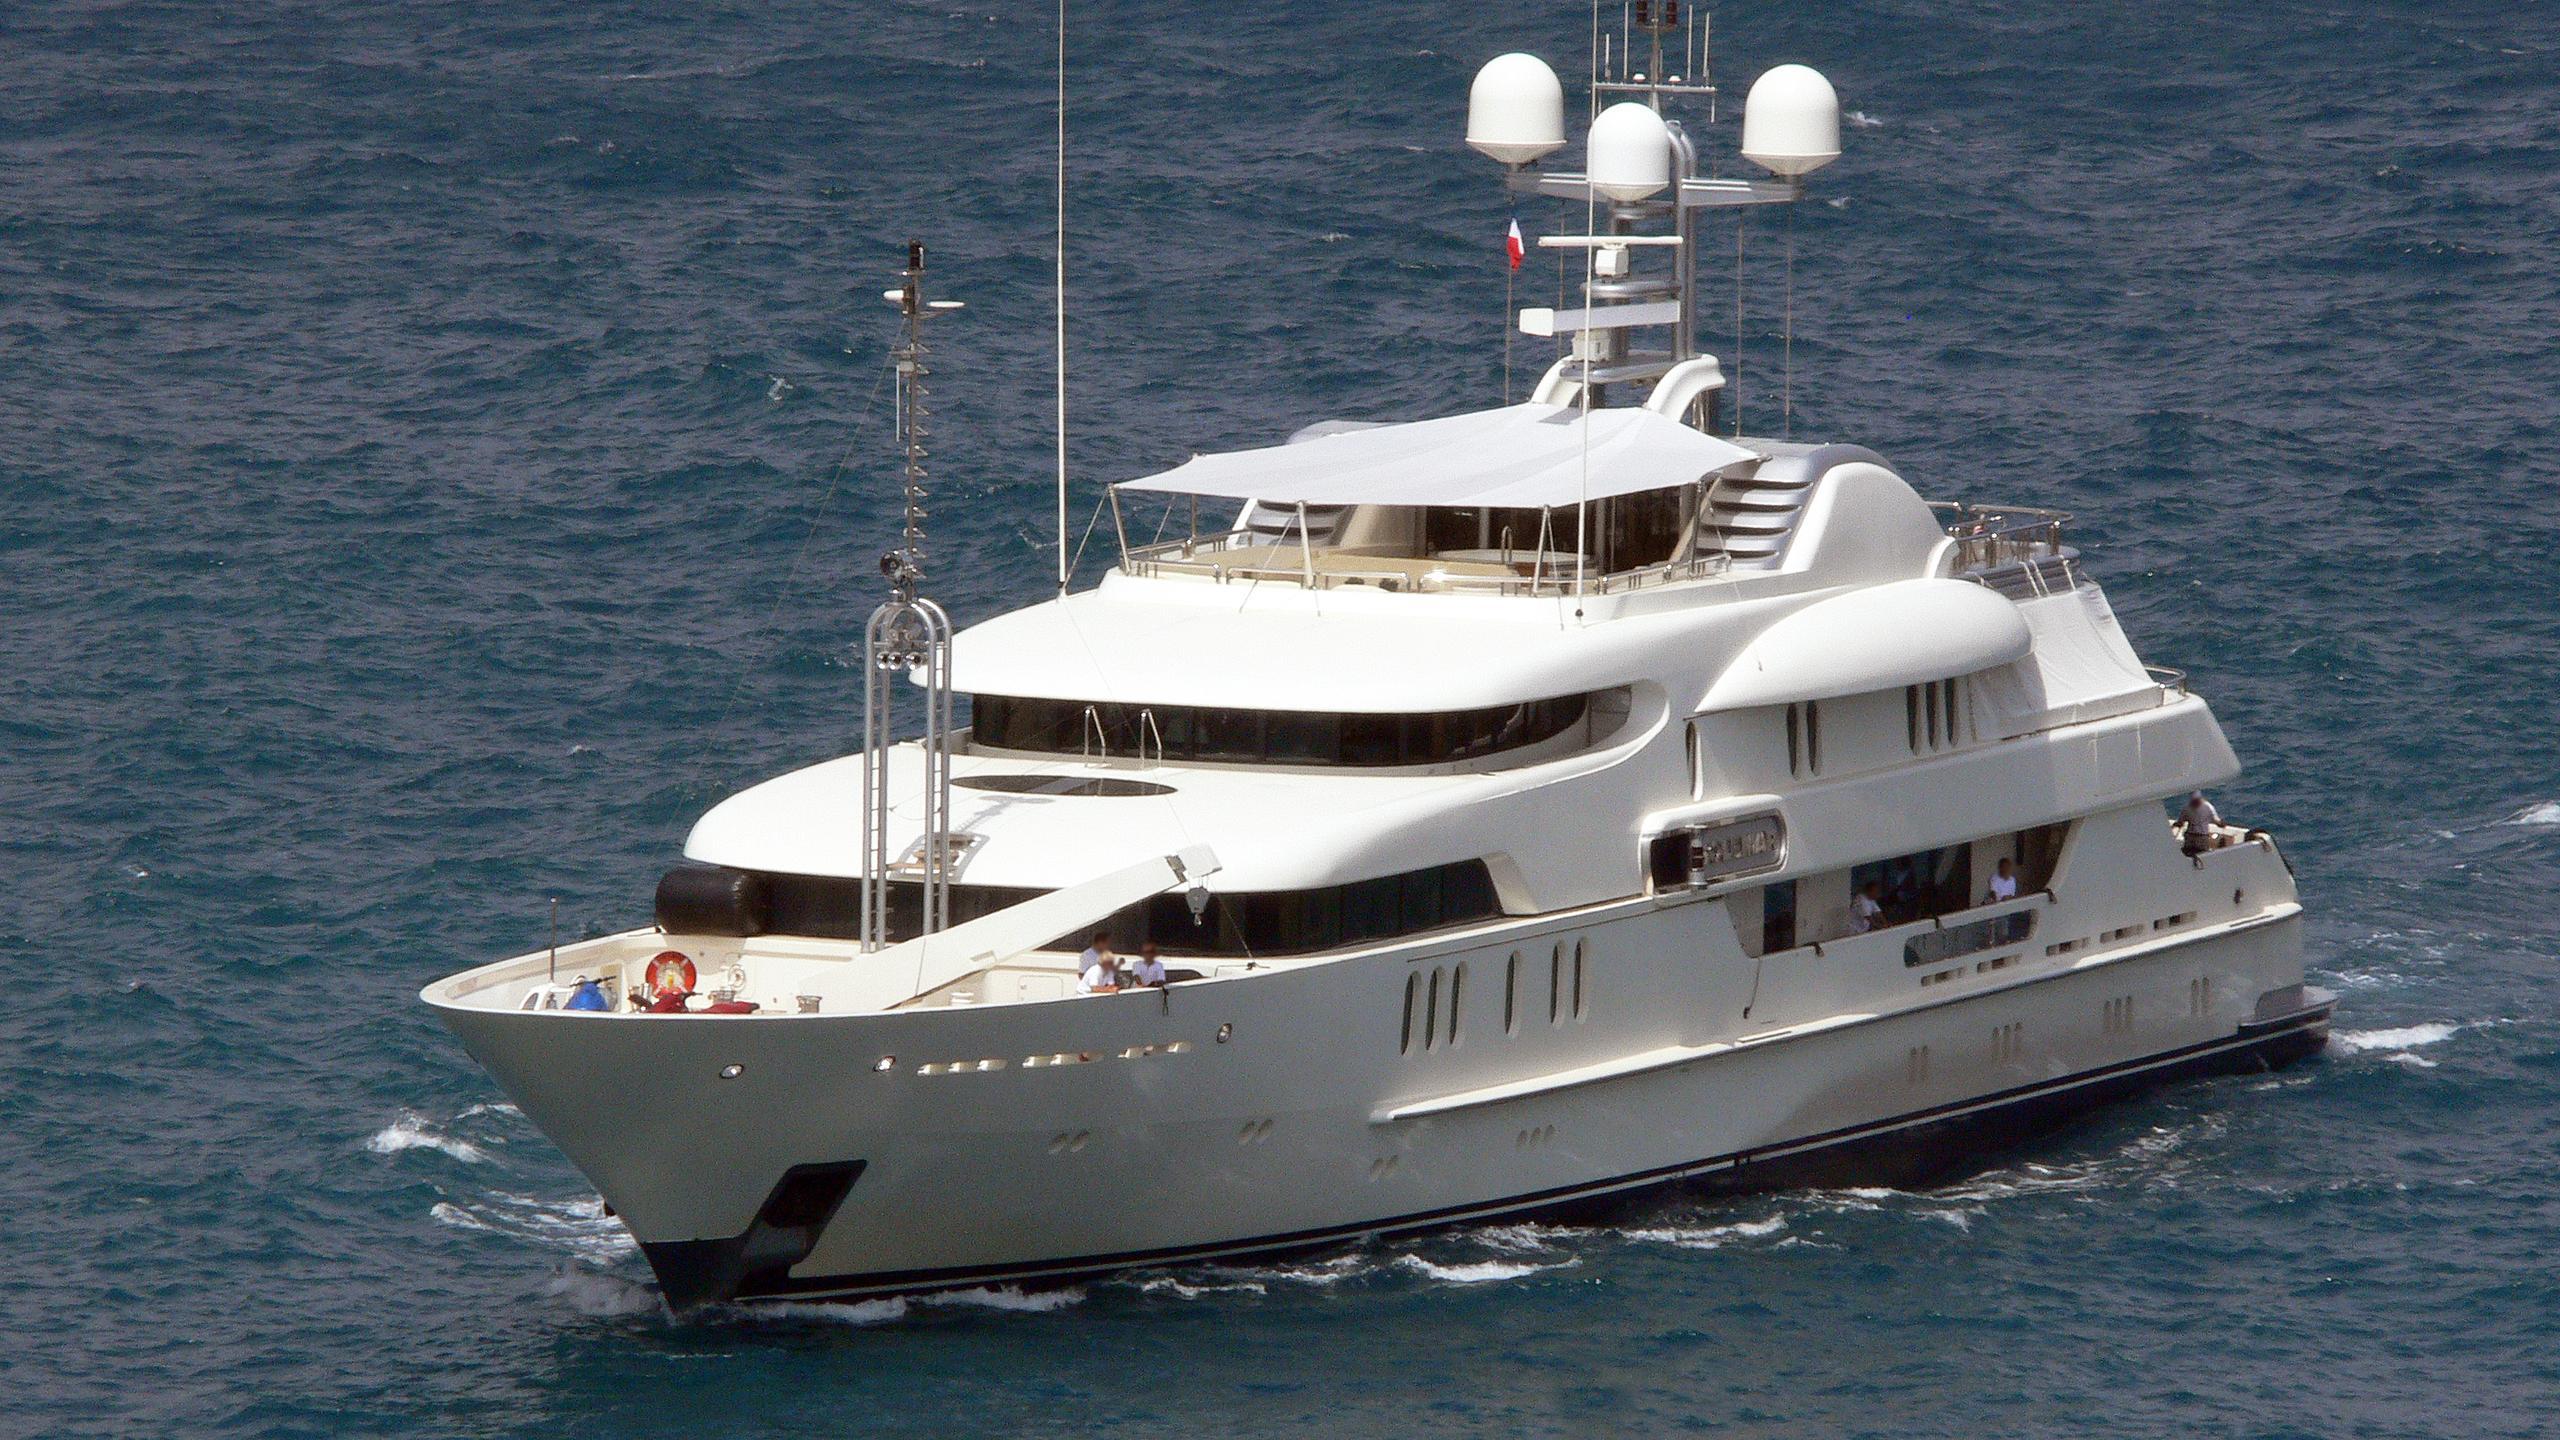 calypso-solemar-motor-yacht-amels-2003-61m-half-profile